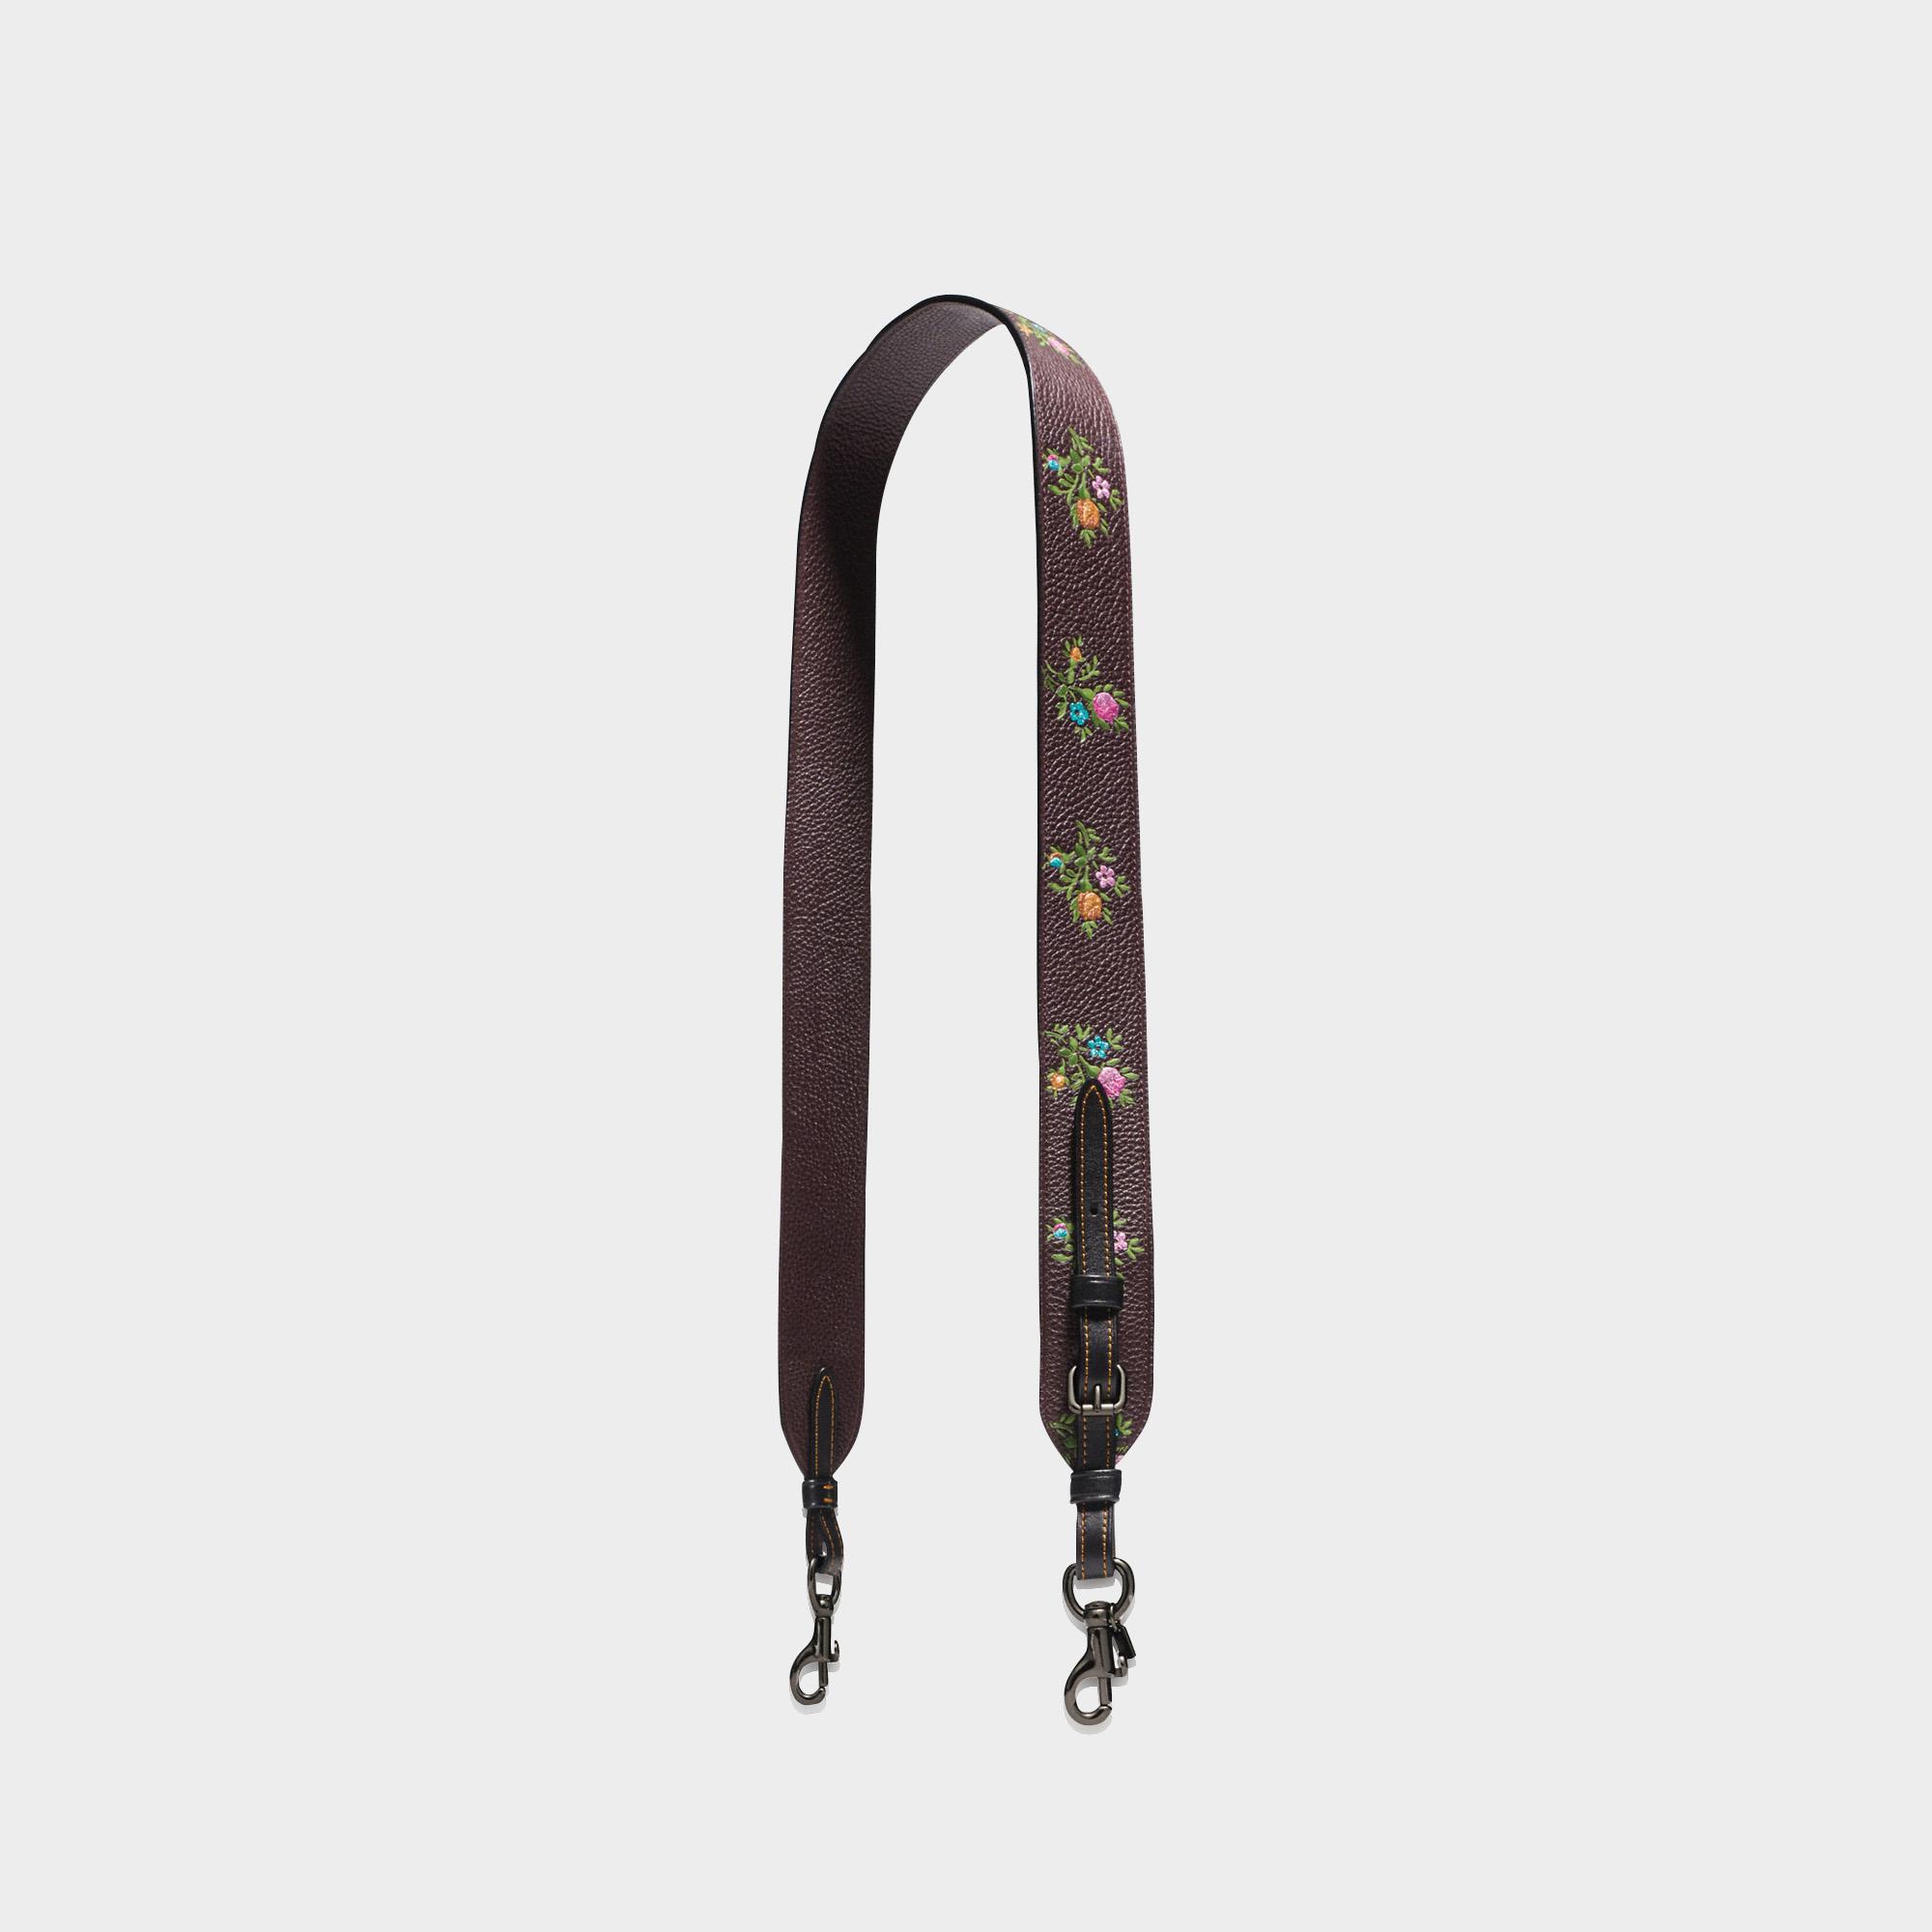 Topkwaliteit Te Koop Krijgen Om Te Kopen Coach Floral Printed Leather Bag Strap in Black Calfskin 7eOuT